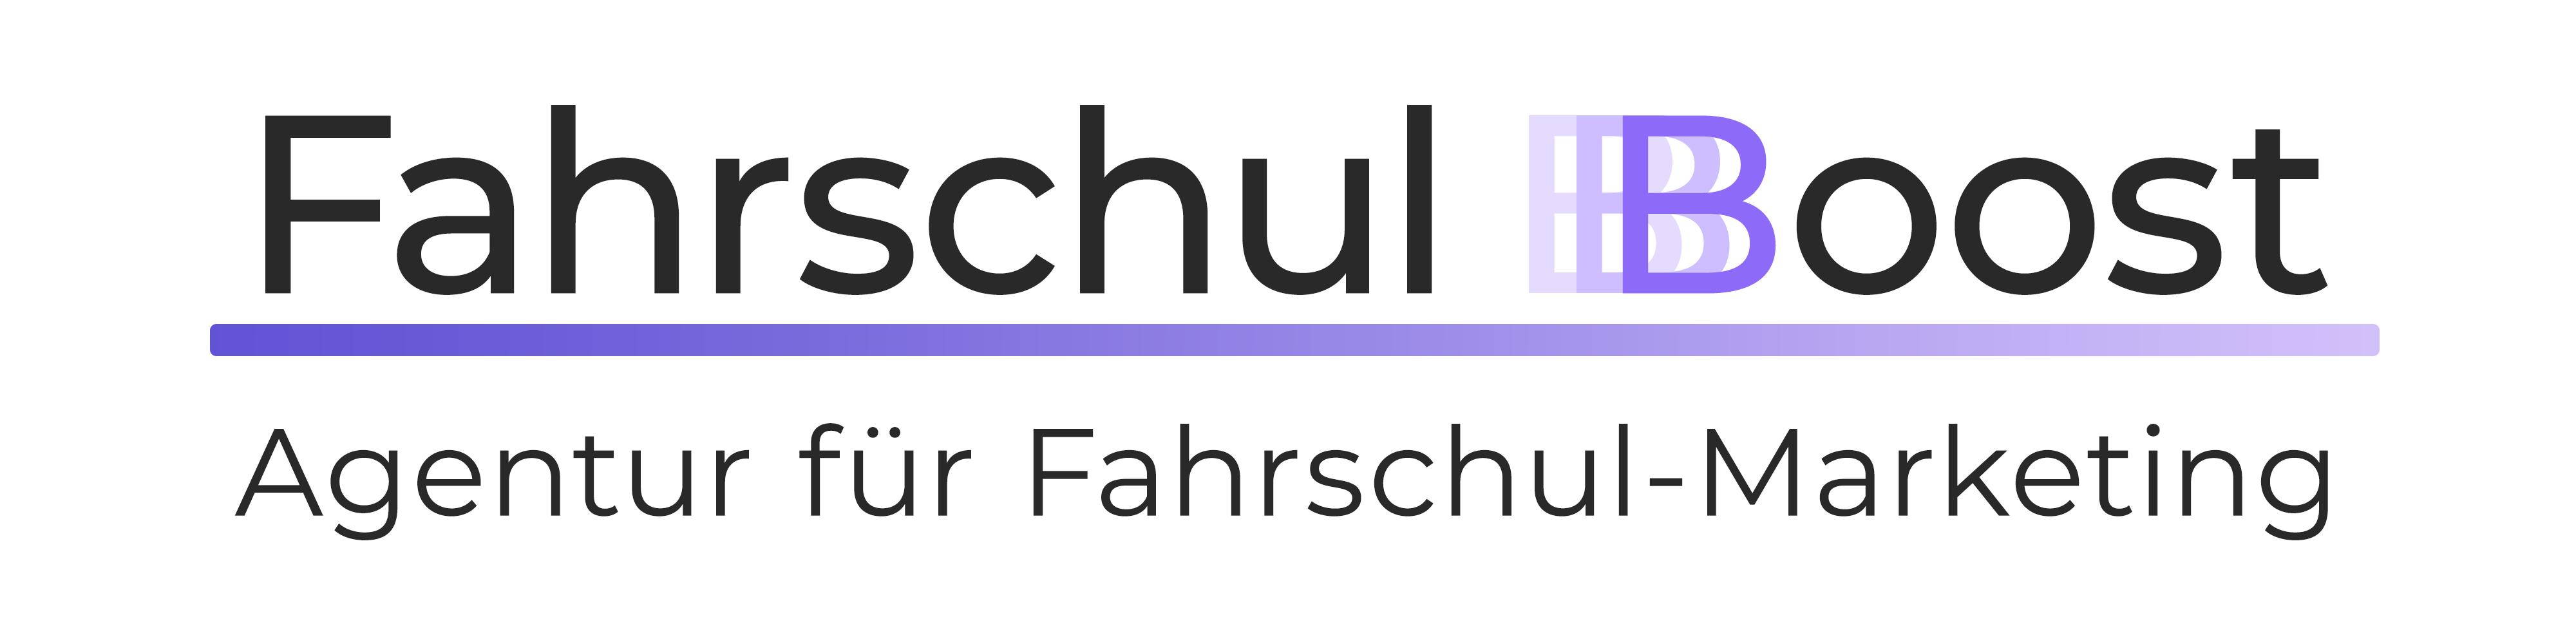 Fahrschul-Boost_Logo Agentur für Fahrschul-Marketing